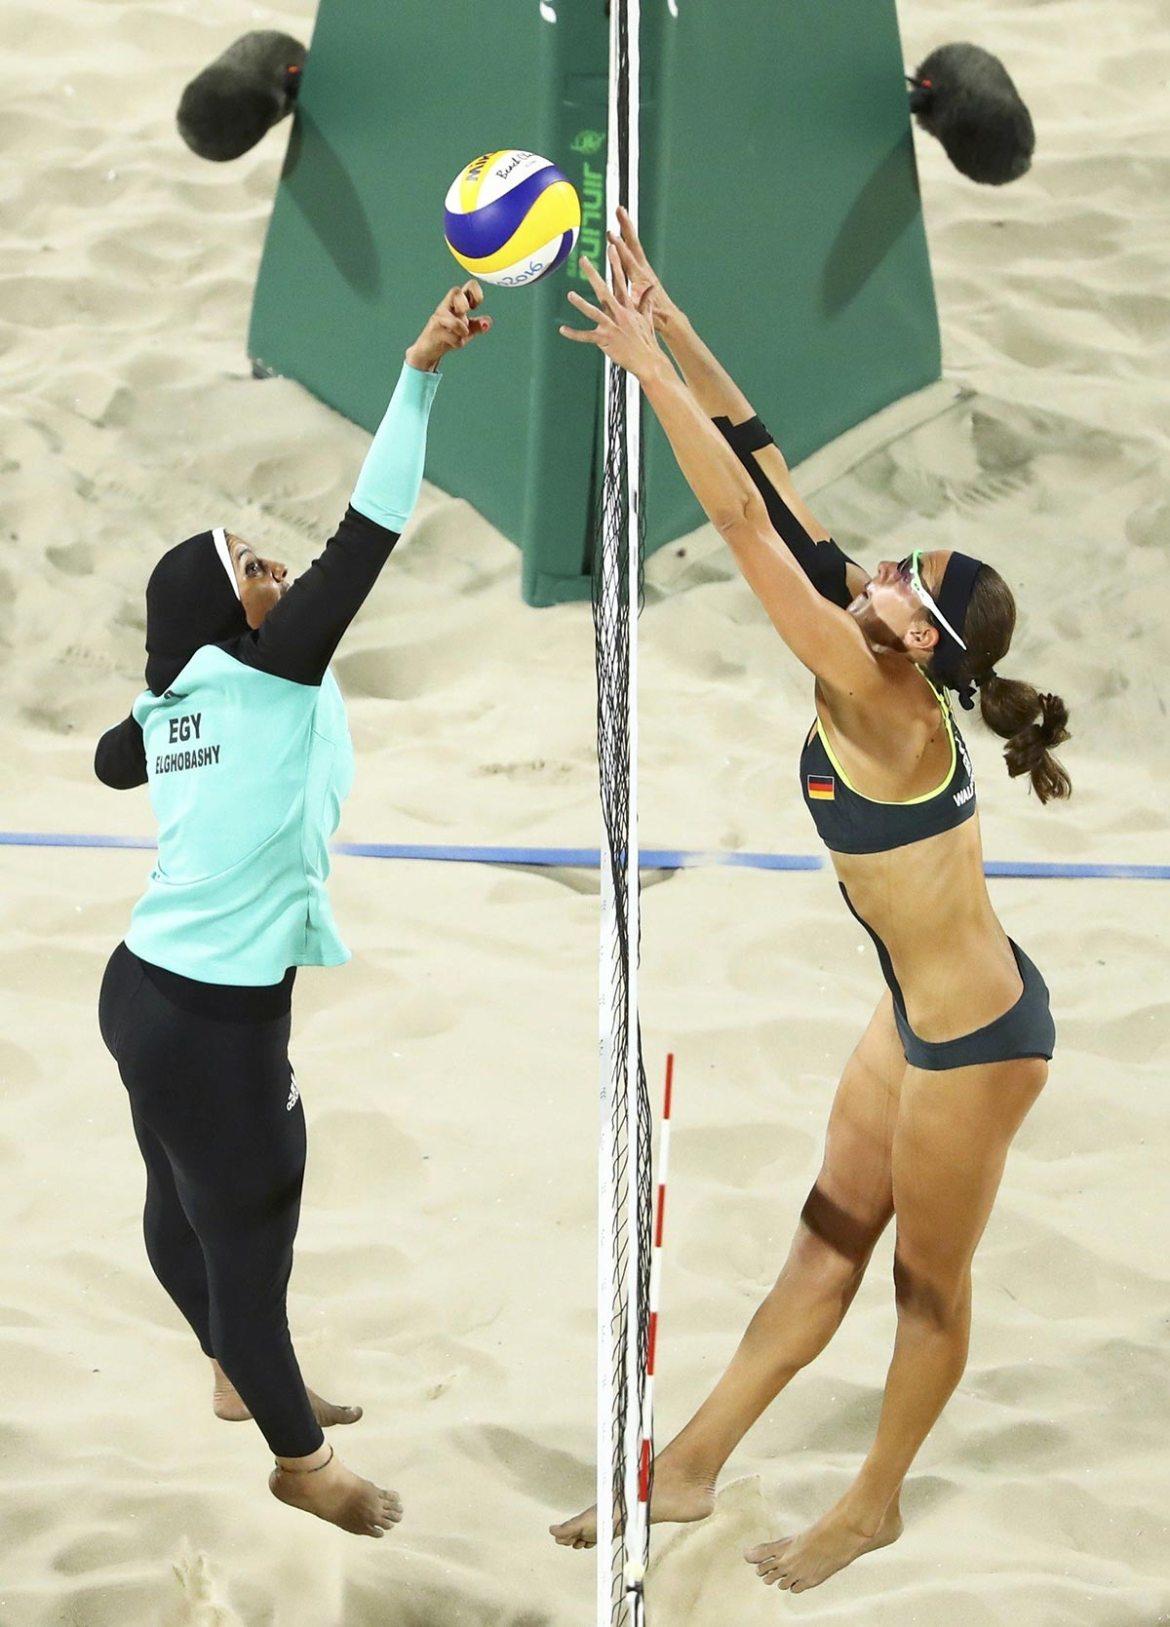 Rio 2016 voleibol egipcia